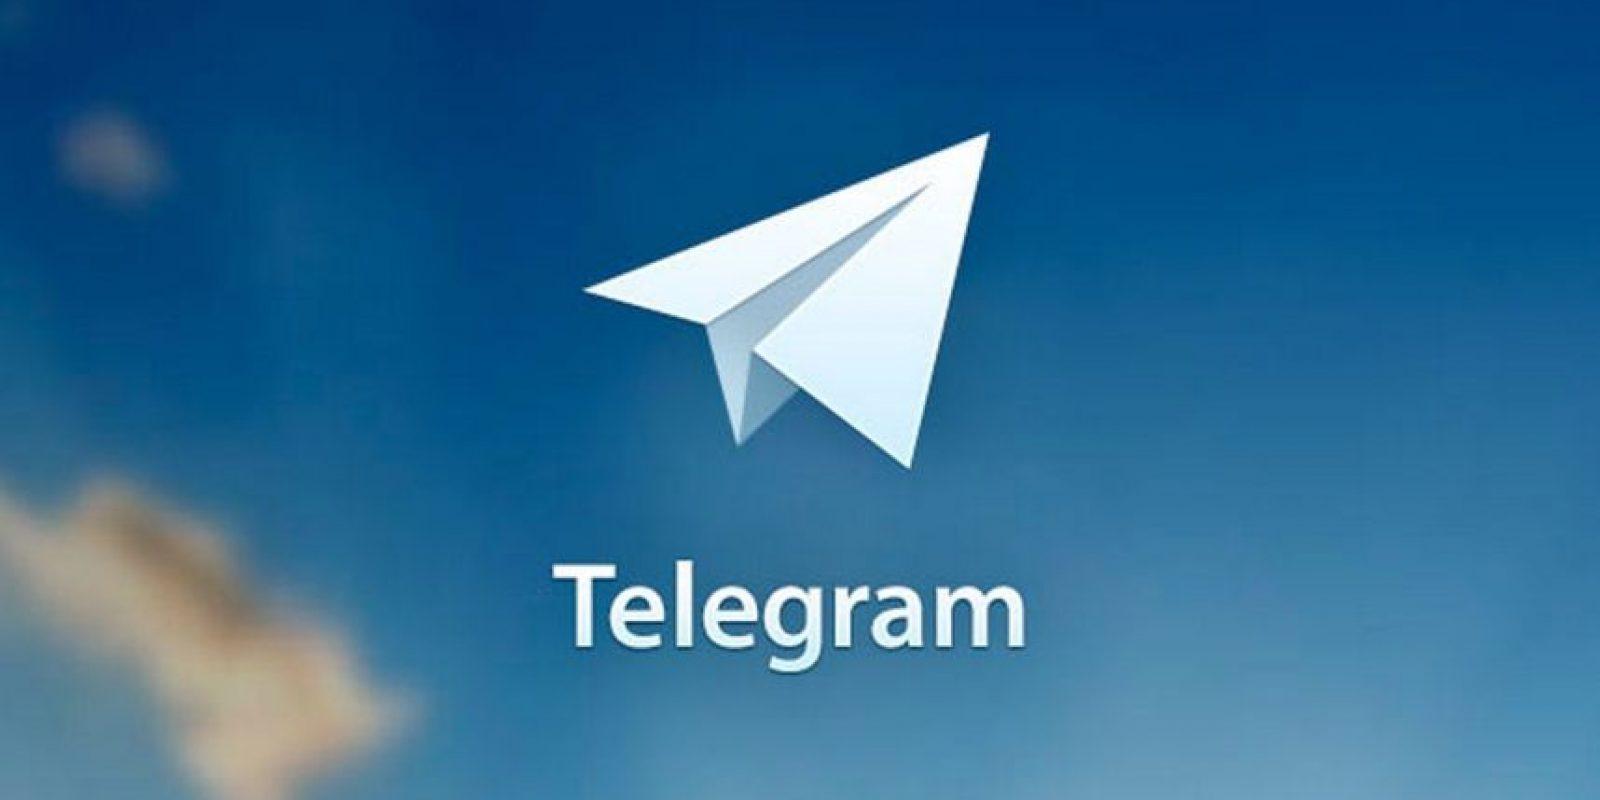 Telegram – Pavel Durov Foto:Telegram